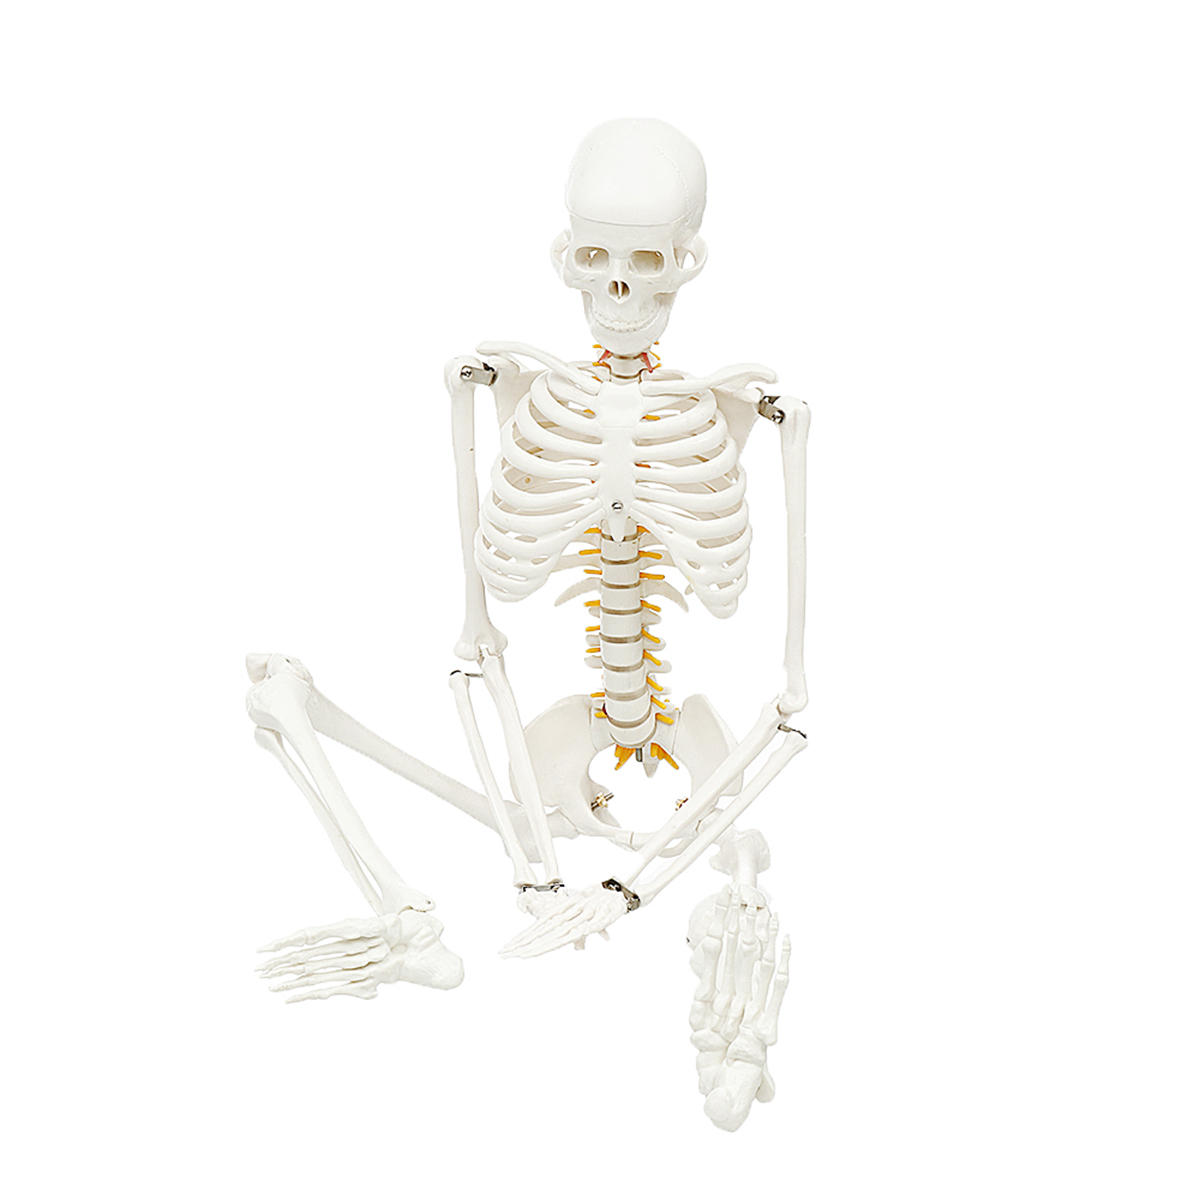 85cm Lifesize Detachable Human Skeleton Bone Model Removable Arms Legs w Stand Anatomical Model Decorations